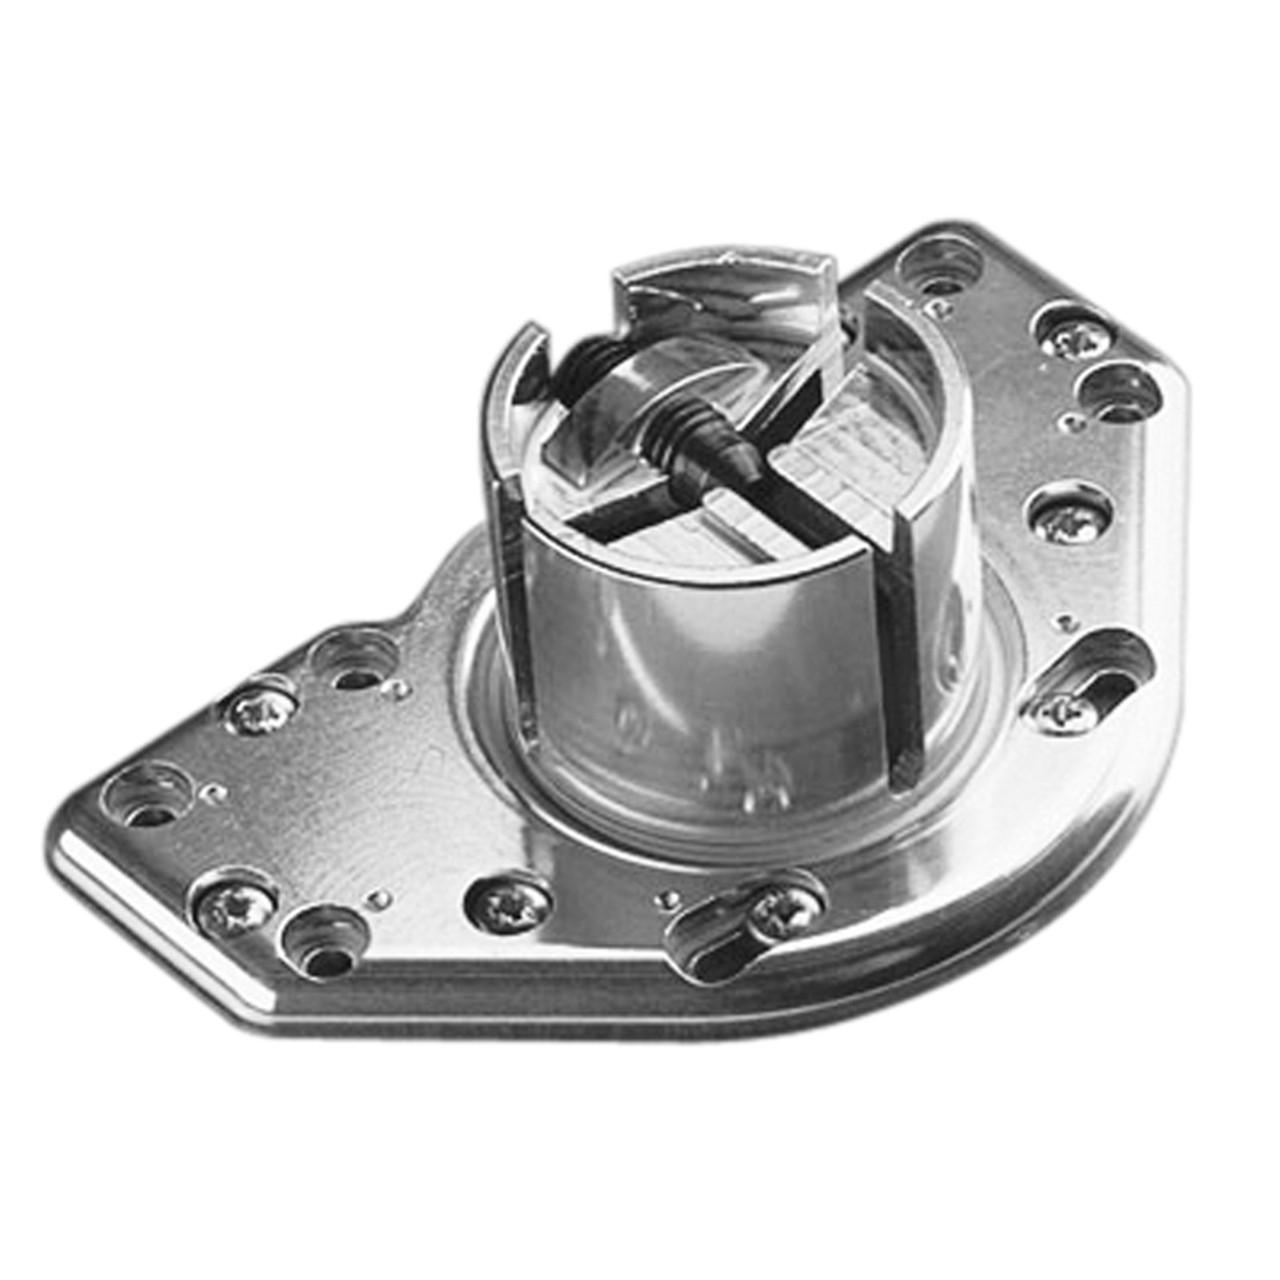 Zoom Table Leg mounting bracket - replacementtablelegs.com